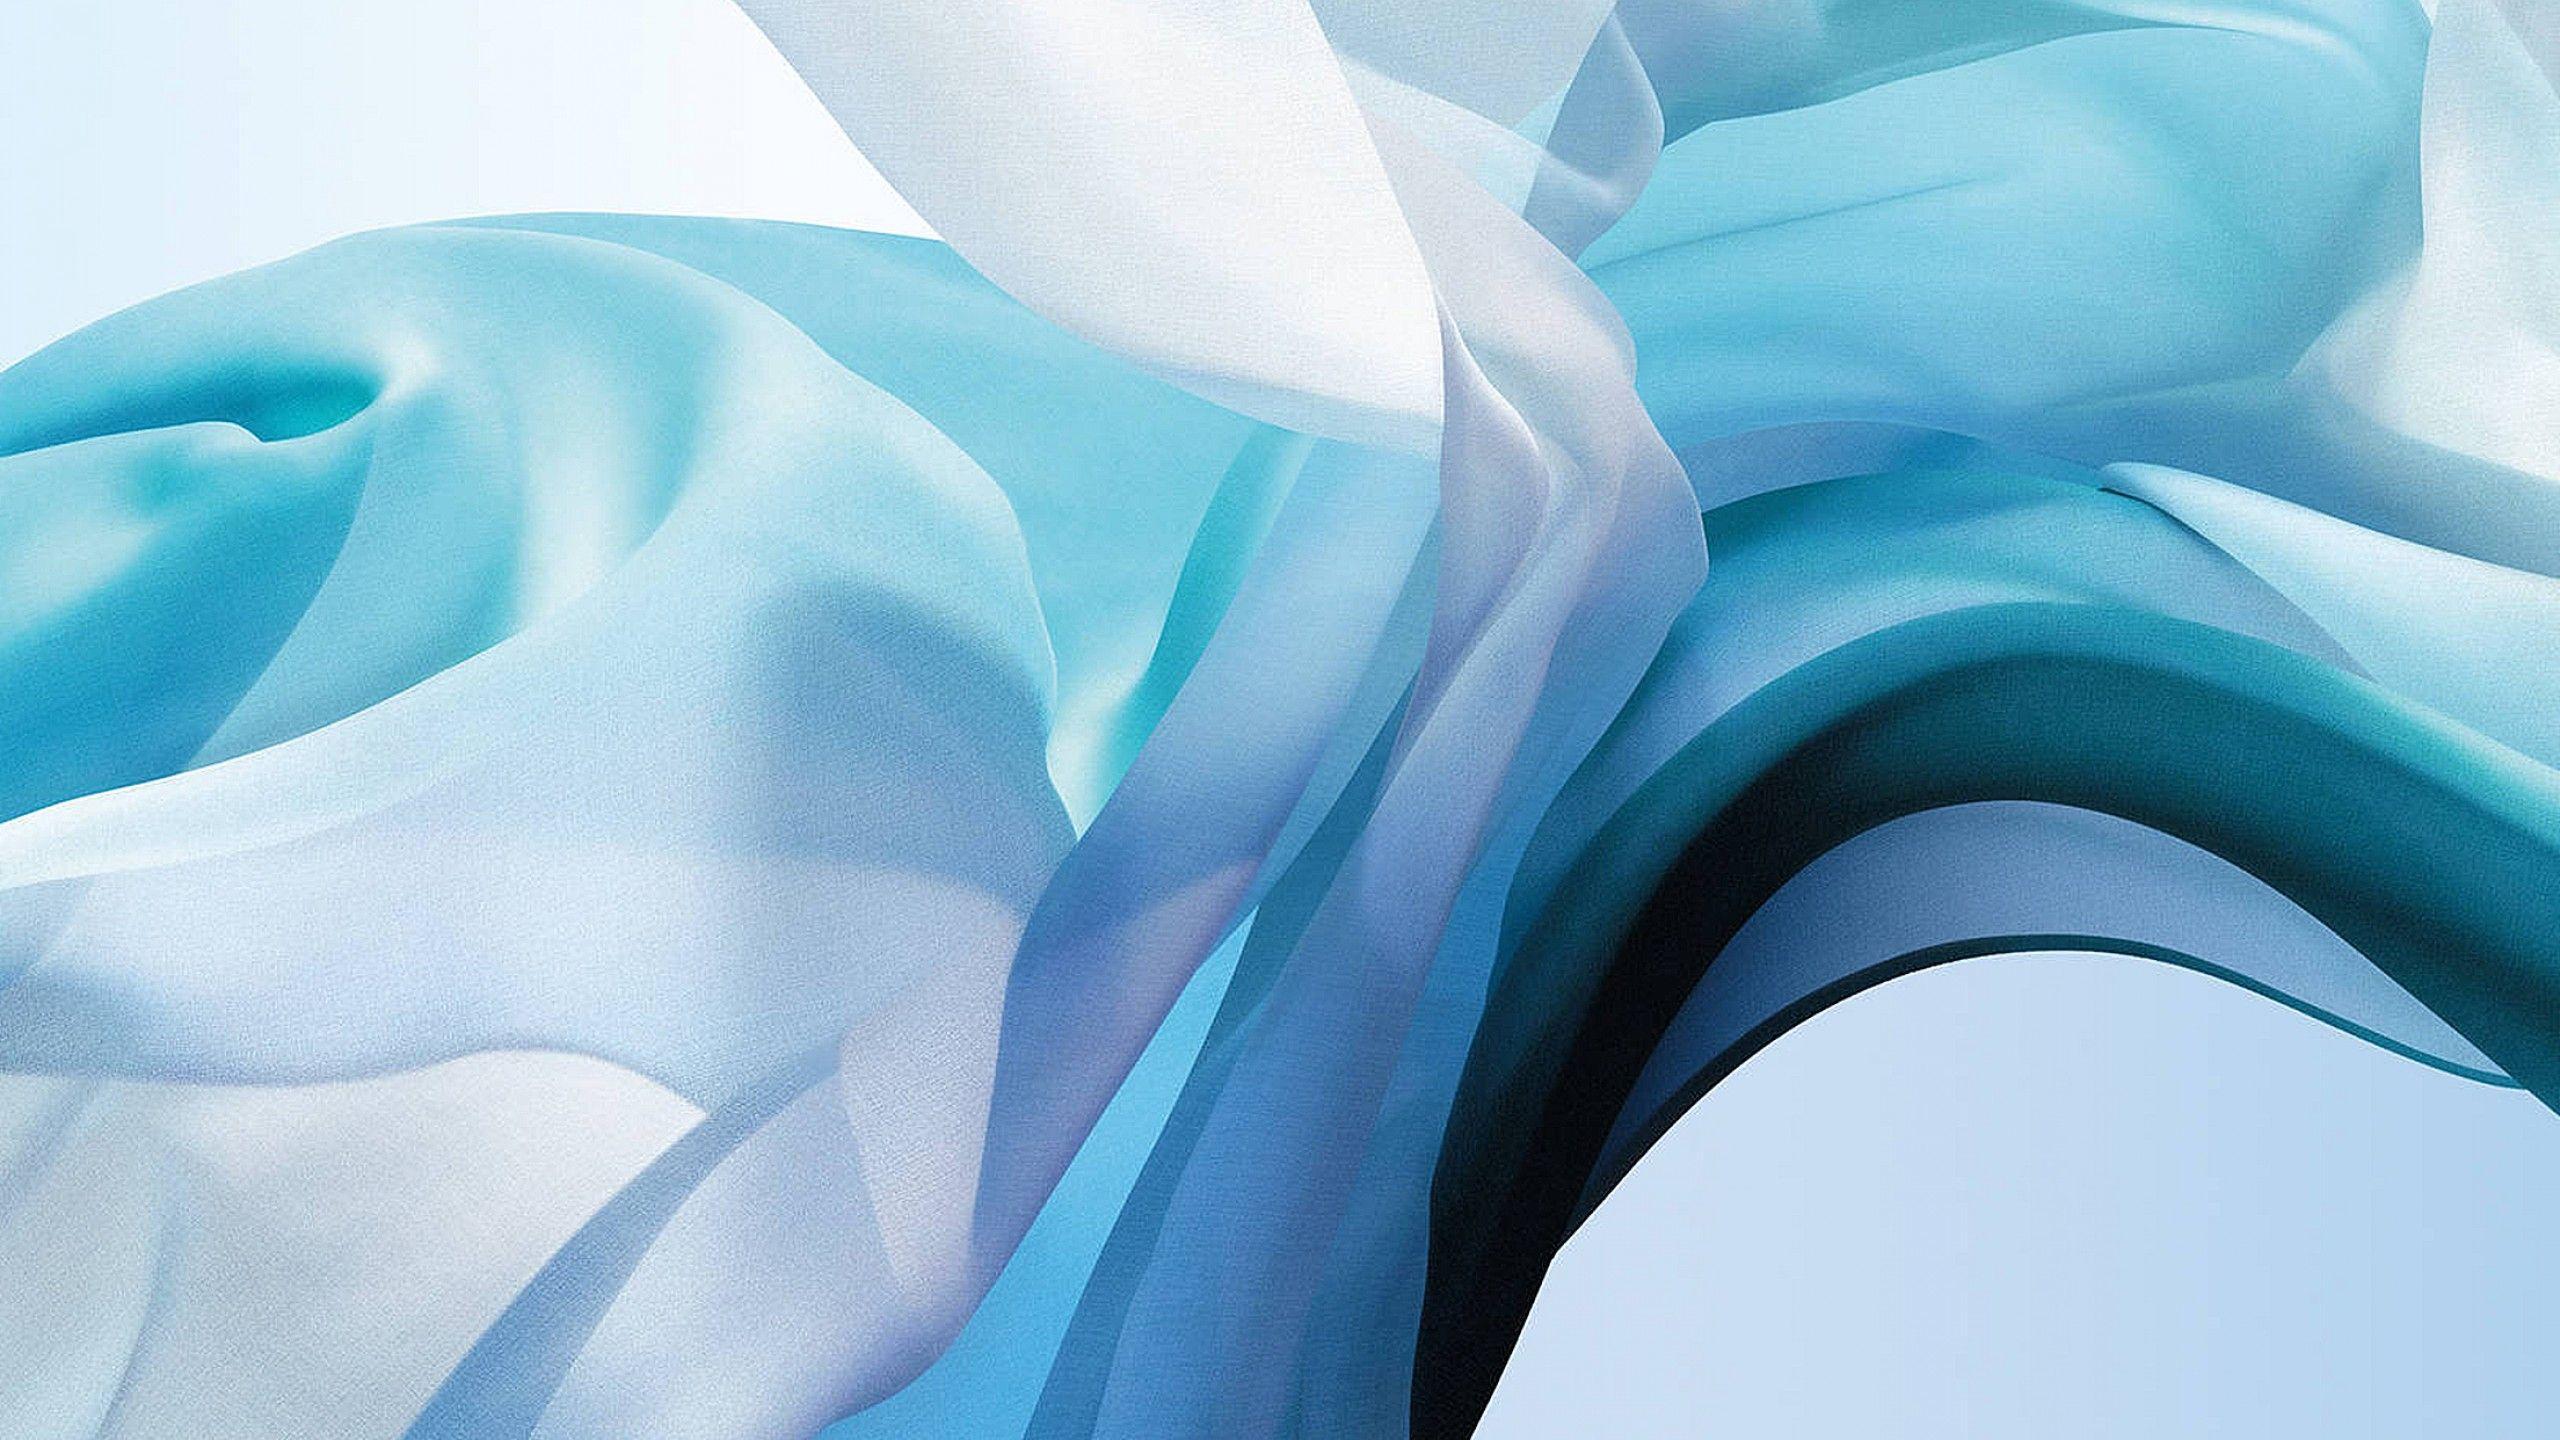 Macbook Air Wallpapers Top Free Macbook Air Backgrounds Wallpaperaccess